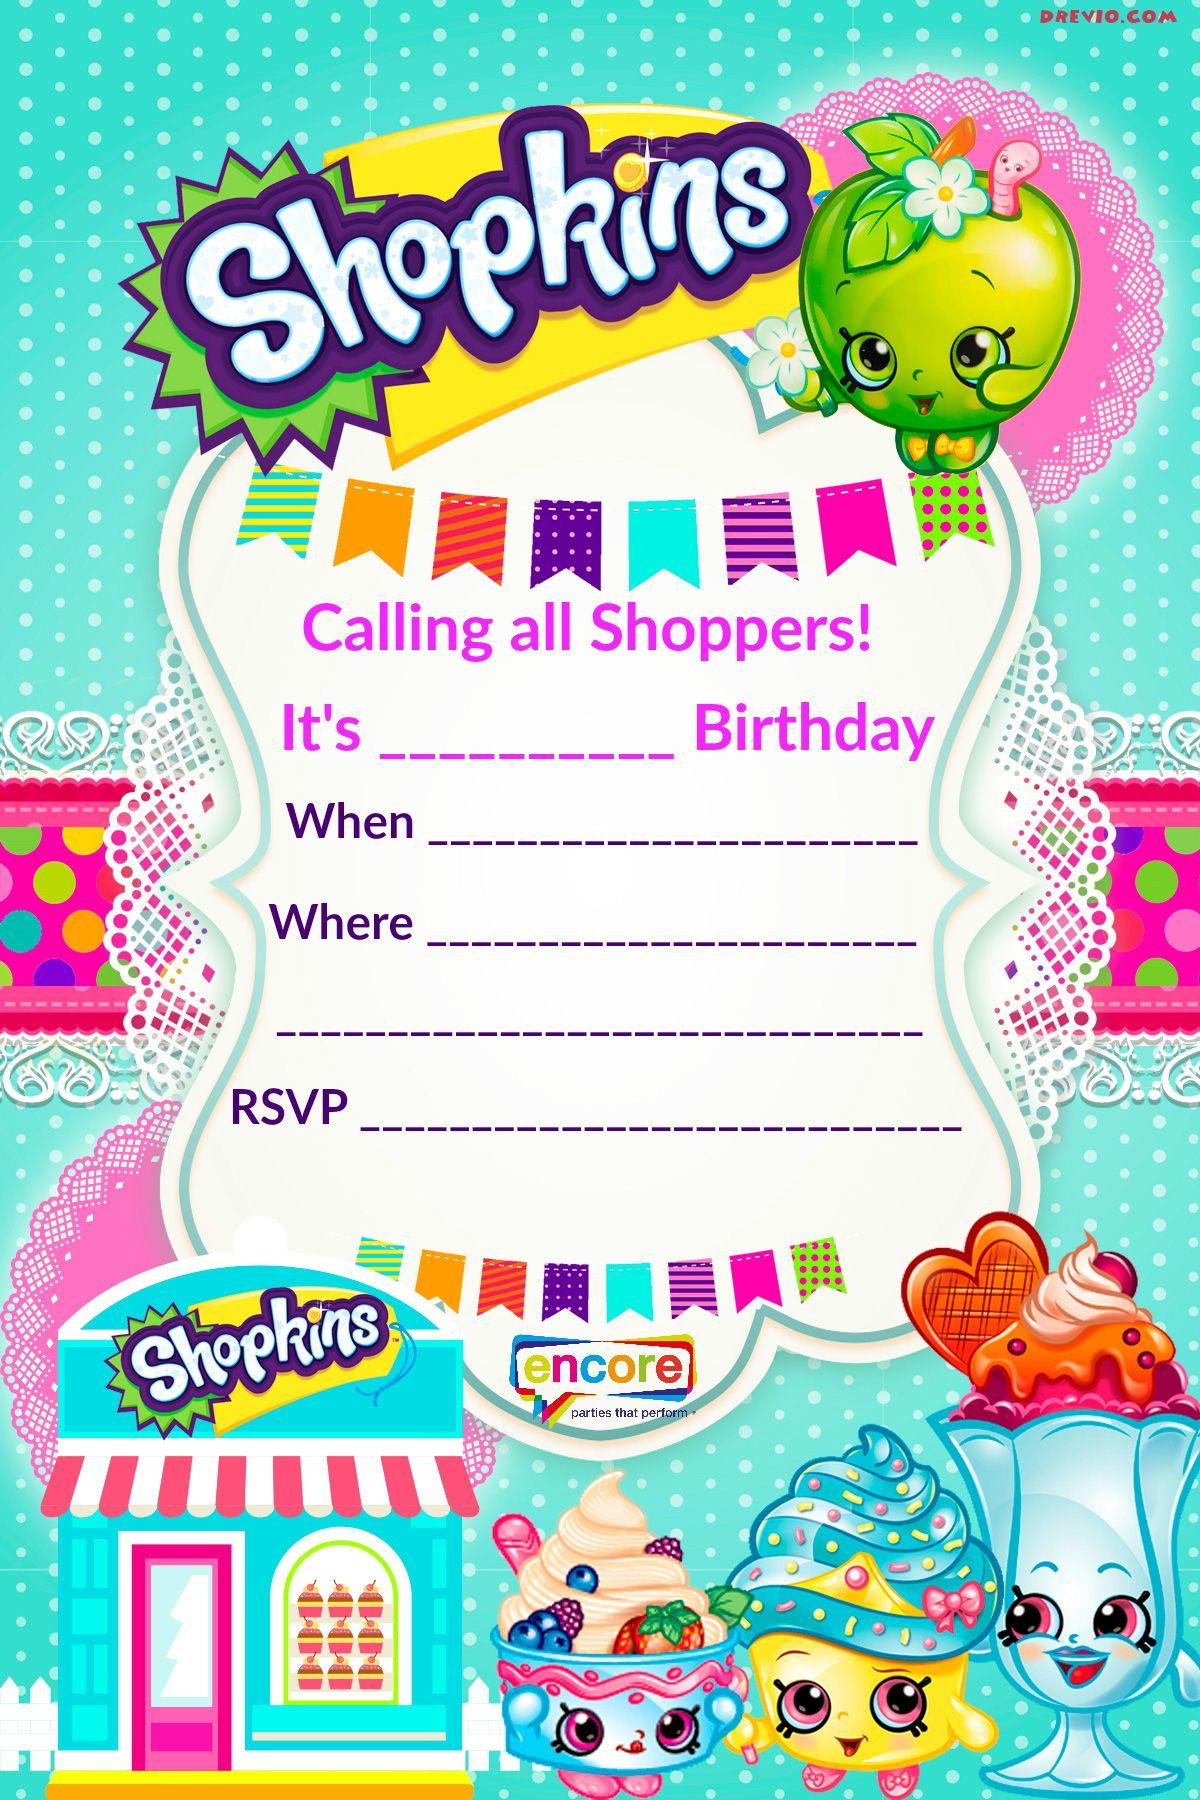 Updated – Free Printable Shopkins Birthday Invitation Template - Free Printable Shopkins Thank You Cards